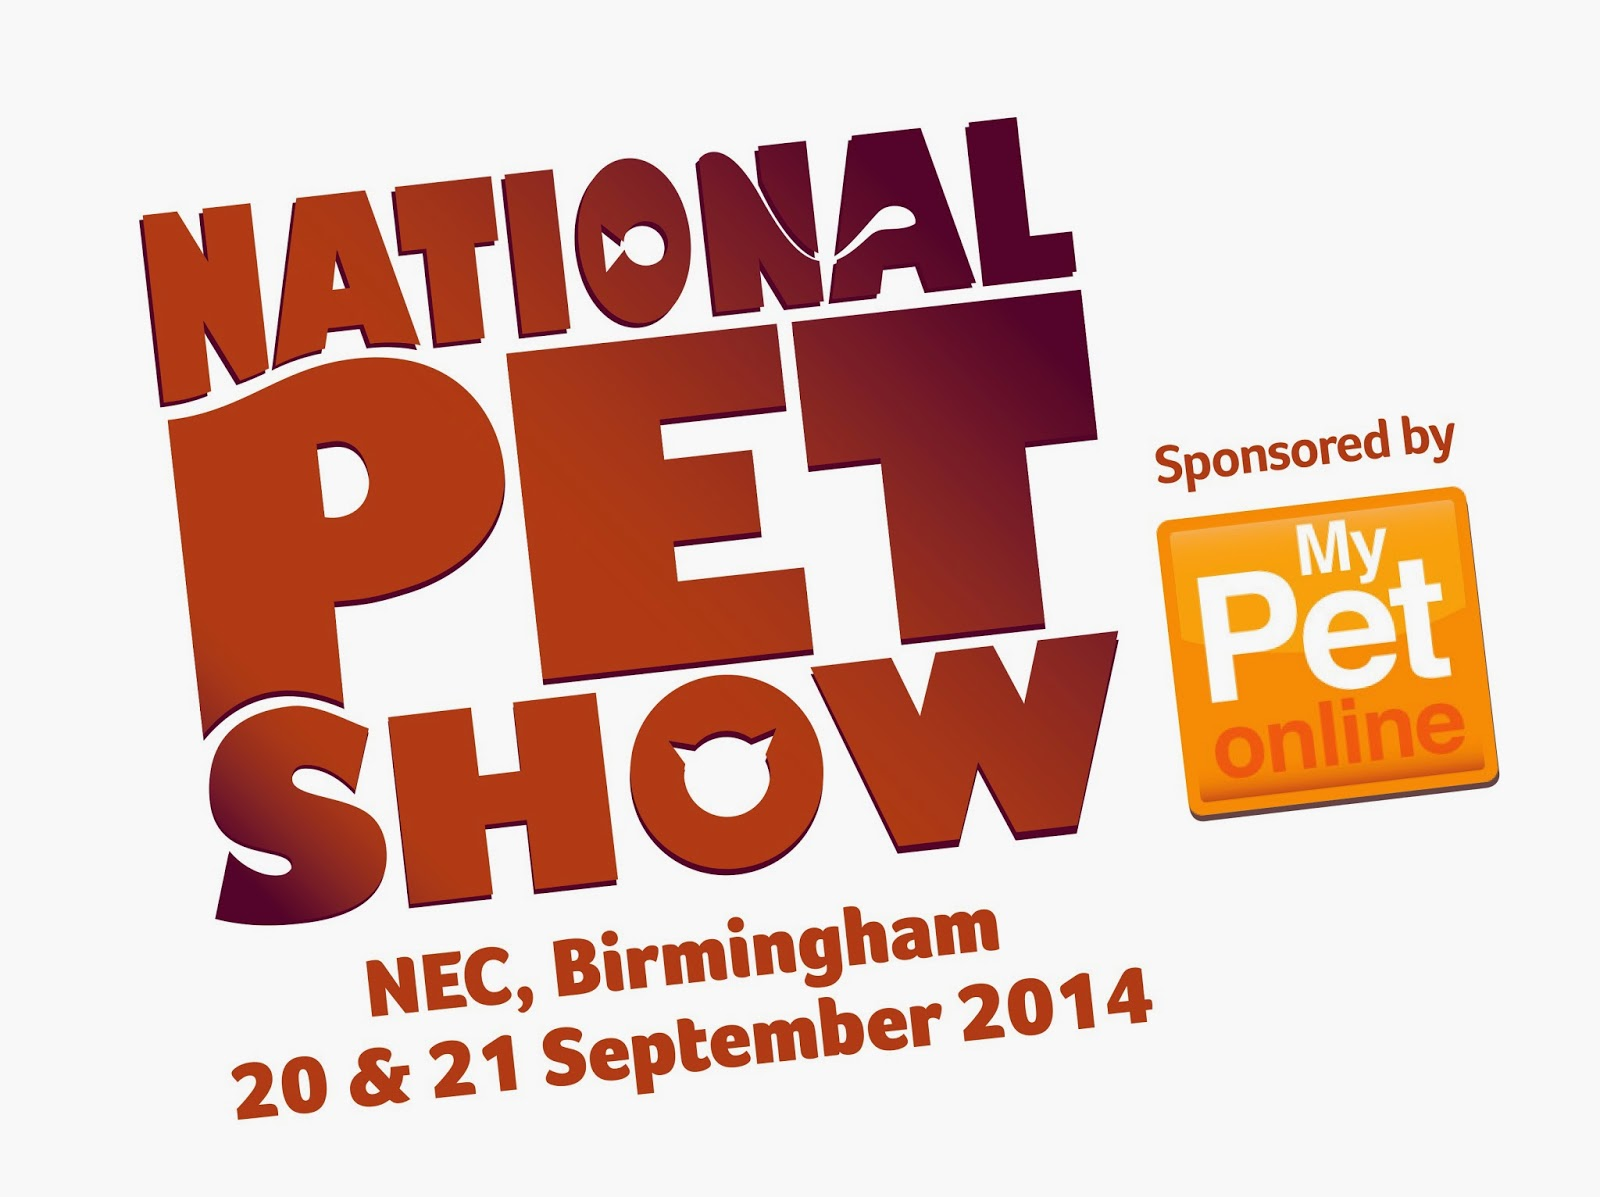 National Pet show Birmingham